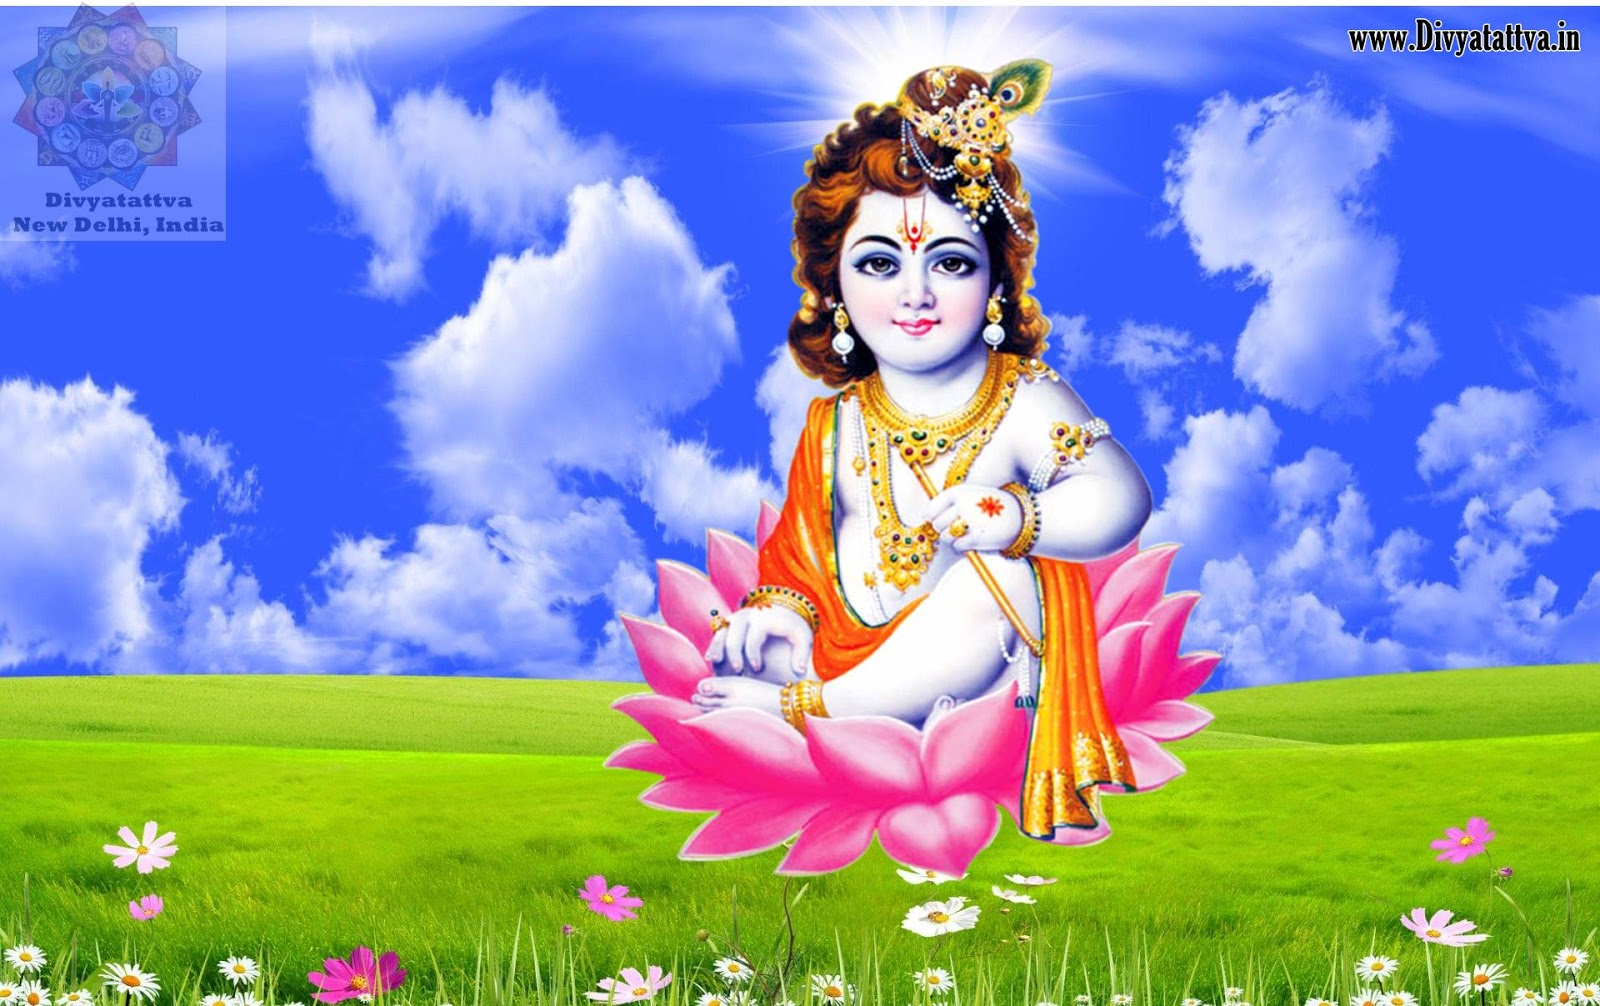 lord krishna hindu gods govinda baby krishna beautiful nature images For Desktop Wallpaper